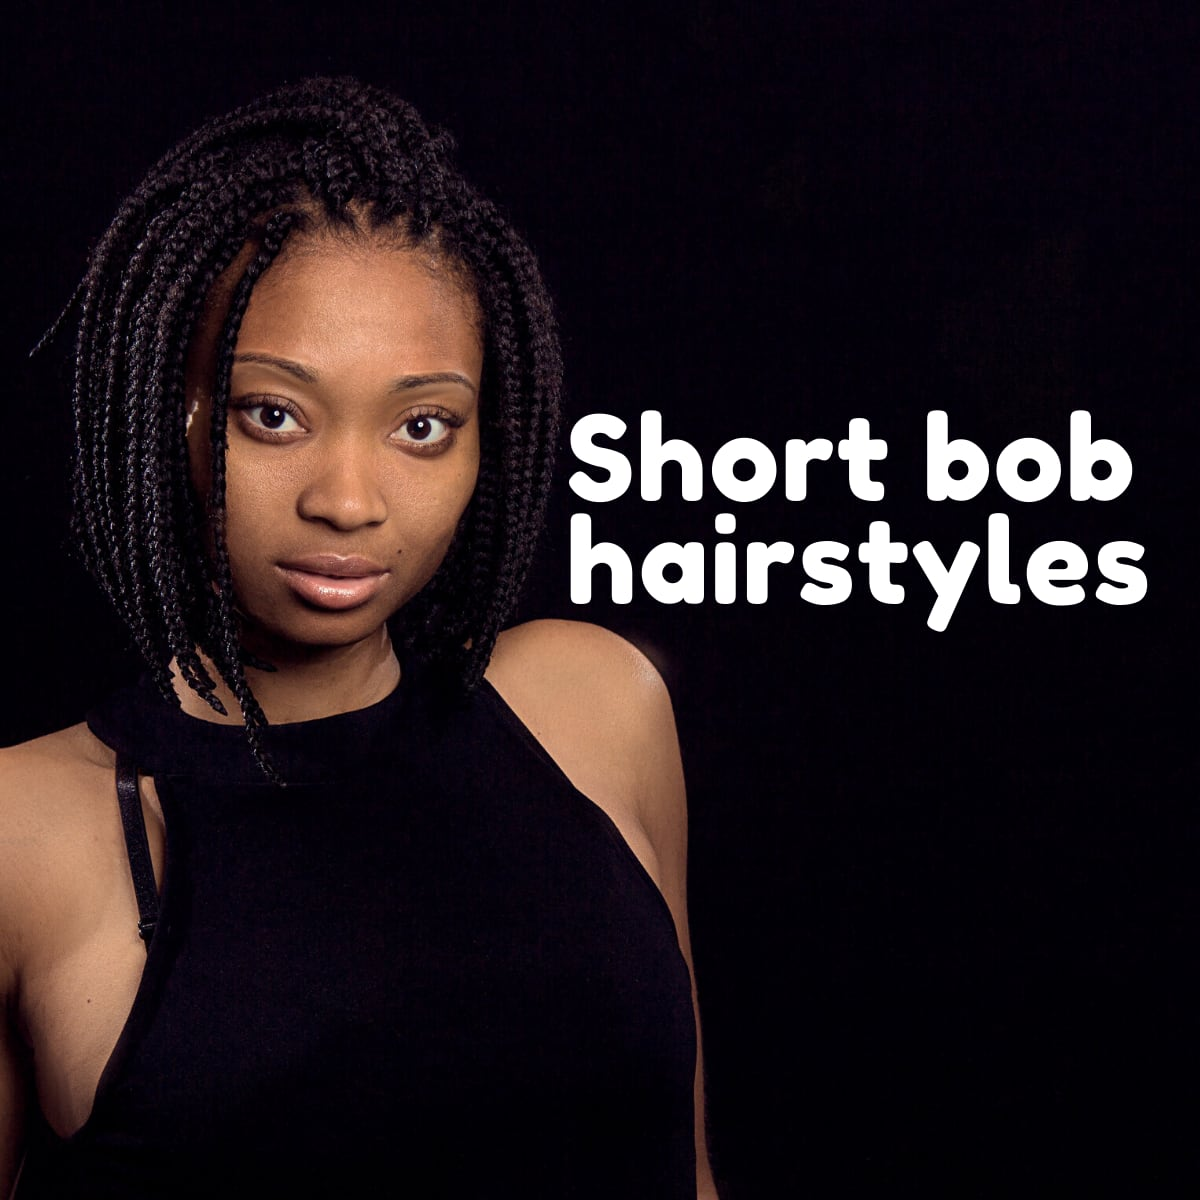 Stupendous 27 Short Bob Hairstyles For Black Women Trending In 2020 Schematic Wiring Diagrams Phreekkolirunnerswayorg